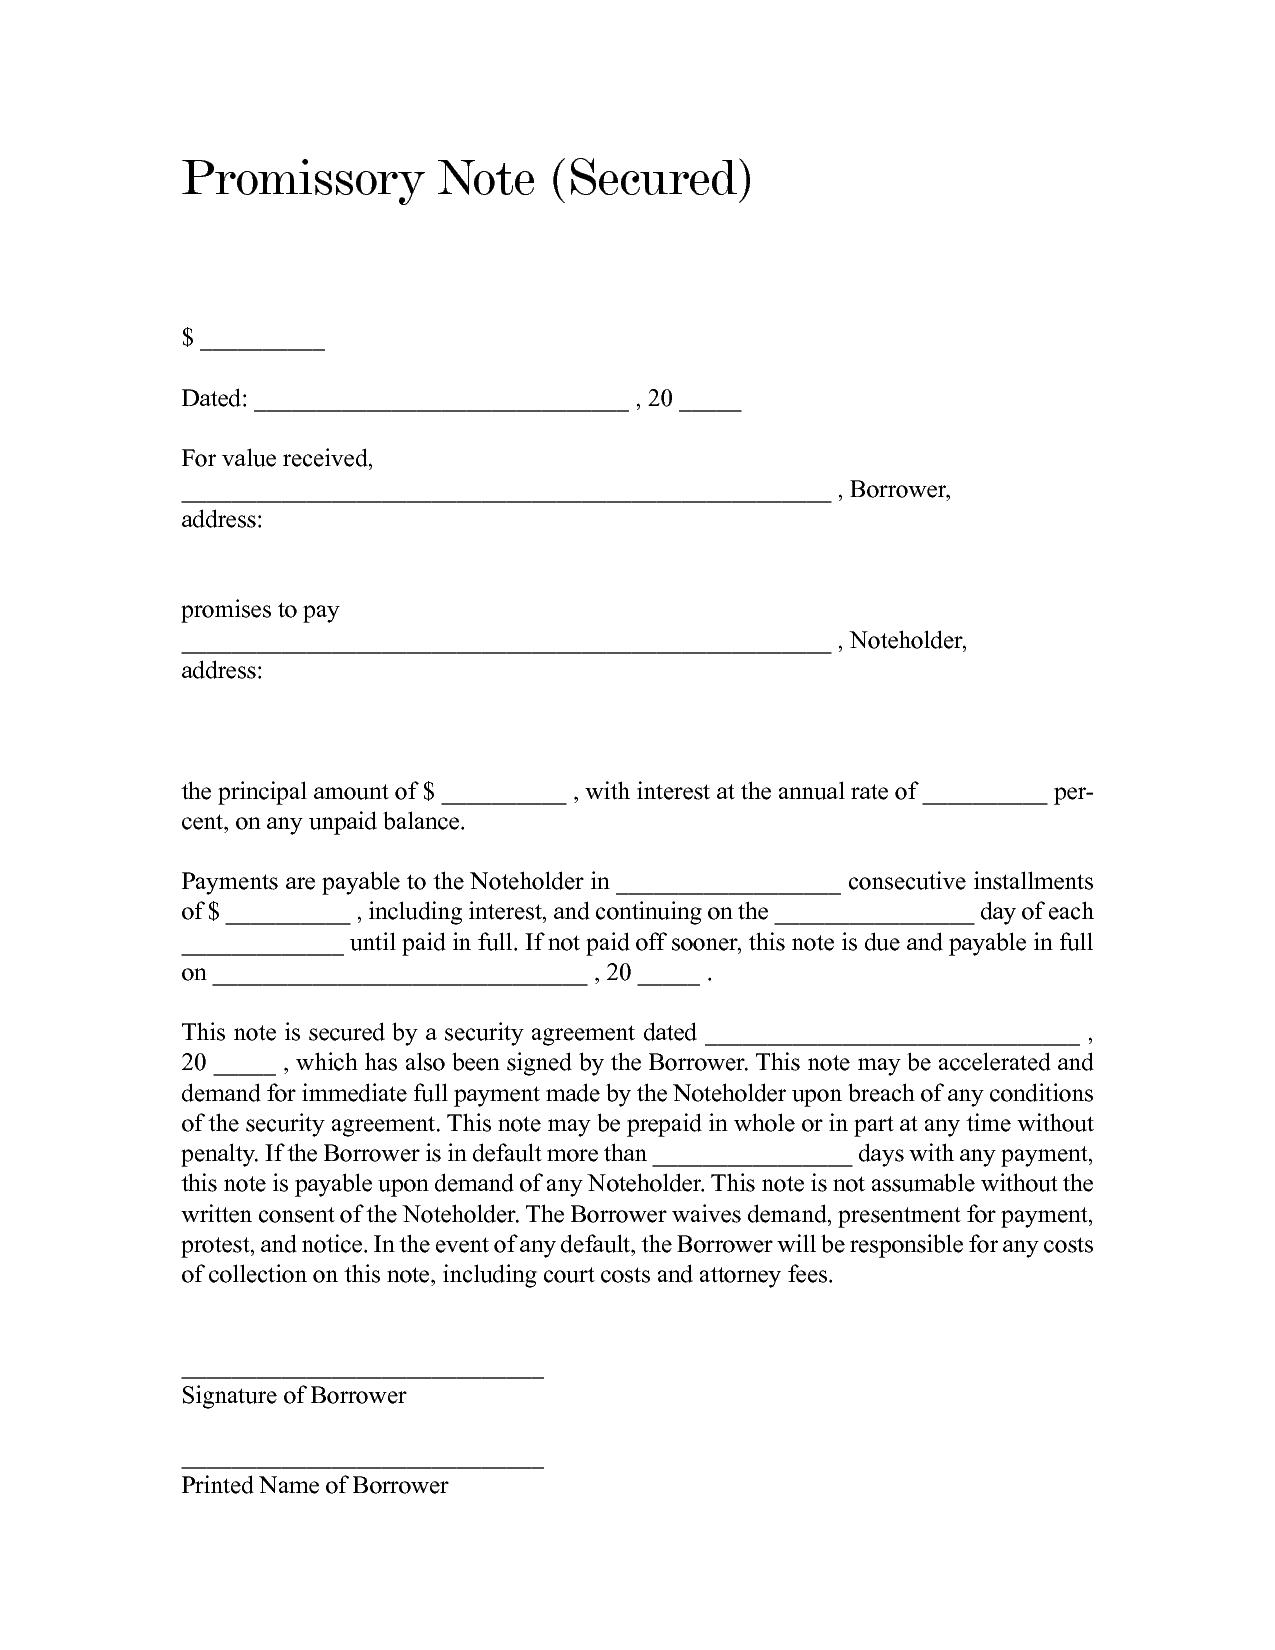 Promissory Note sample 15.41